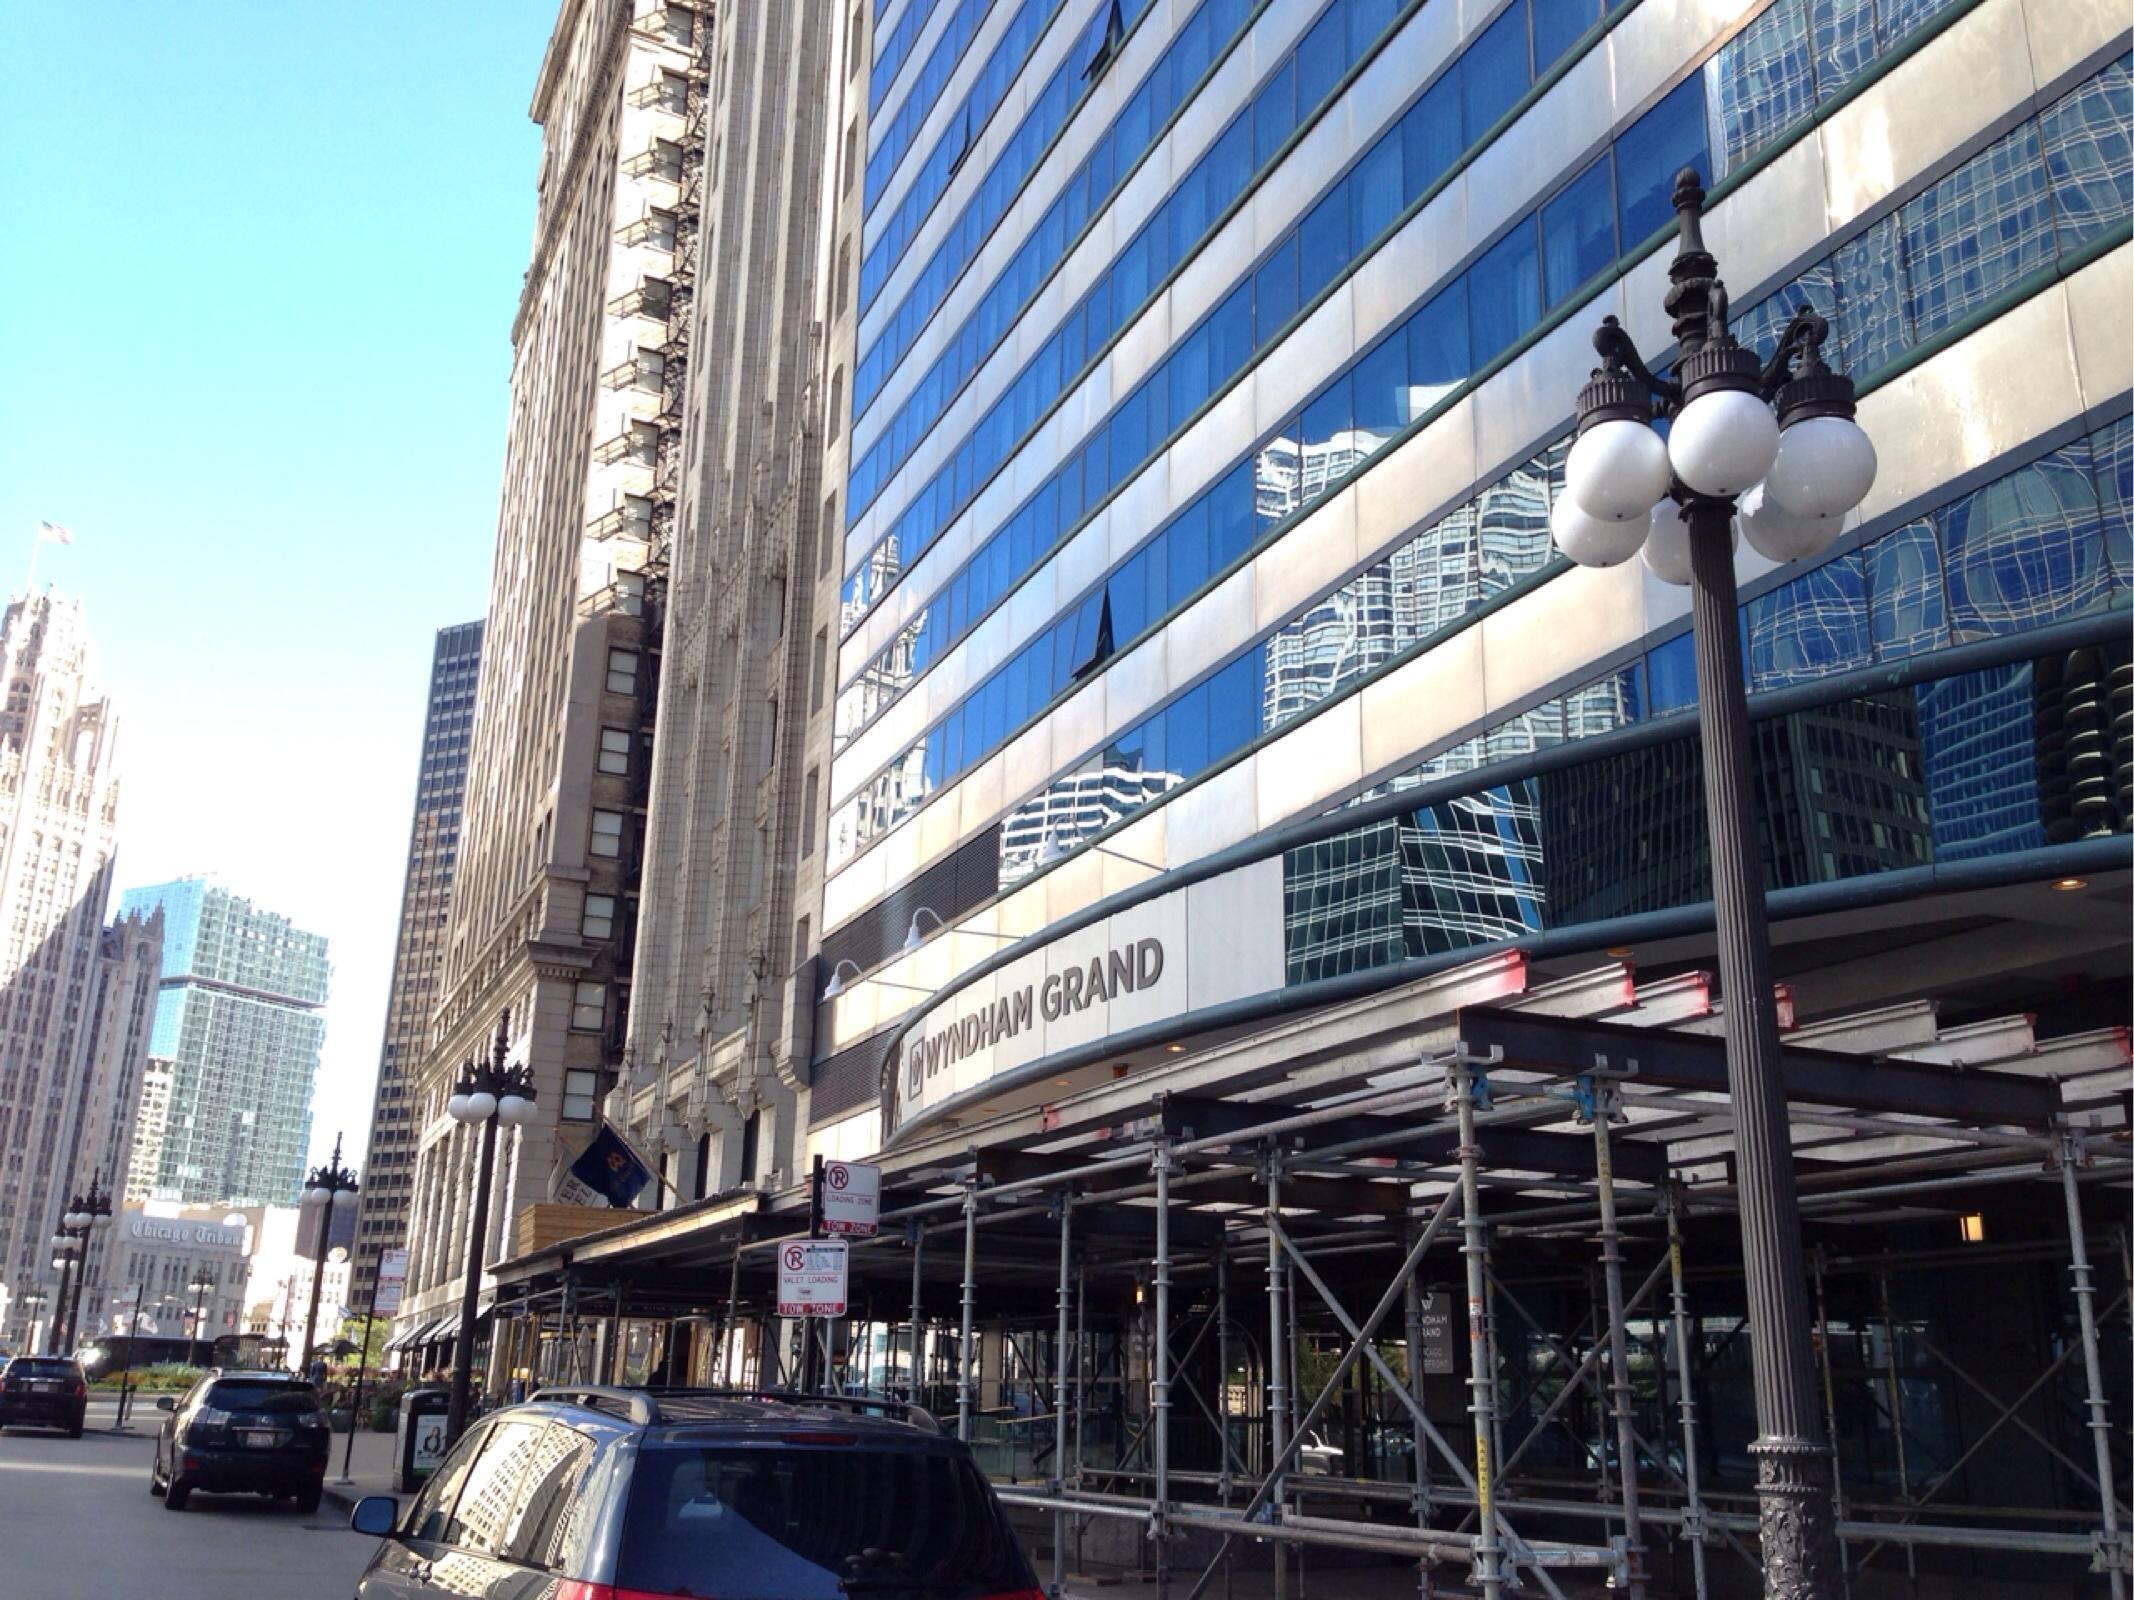 Wyndham grand chicago riverfront valet parking parking for The wyndham